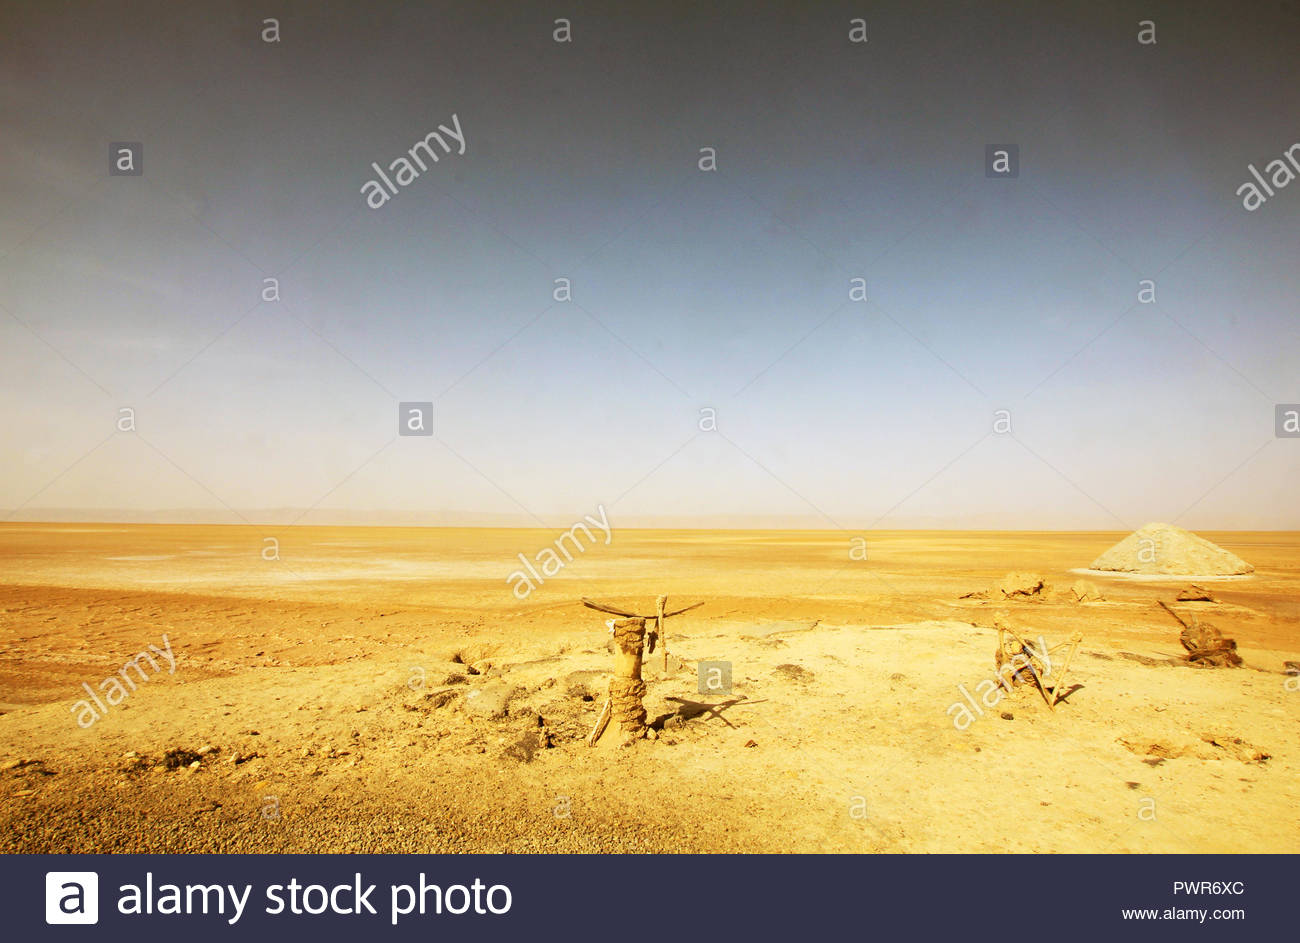 Photo of sandy Sahara desert in Tunisia - Stock Image